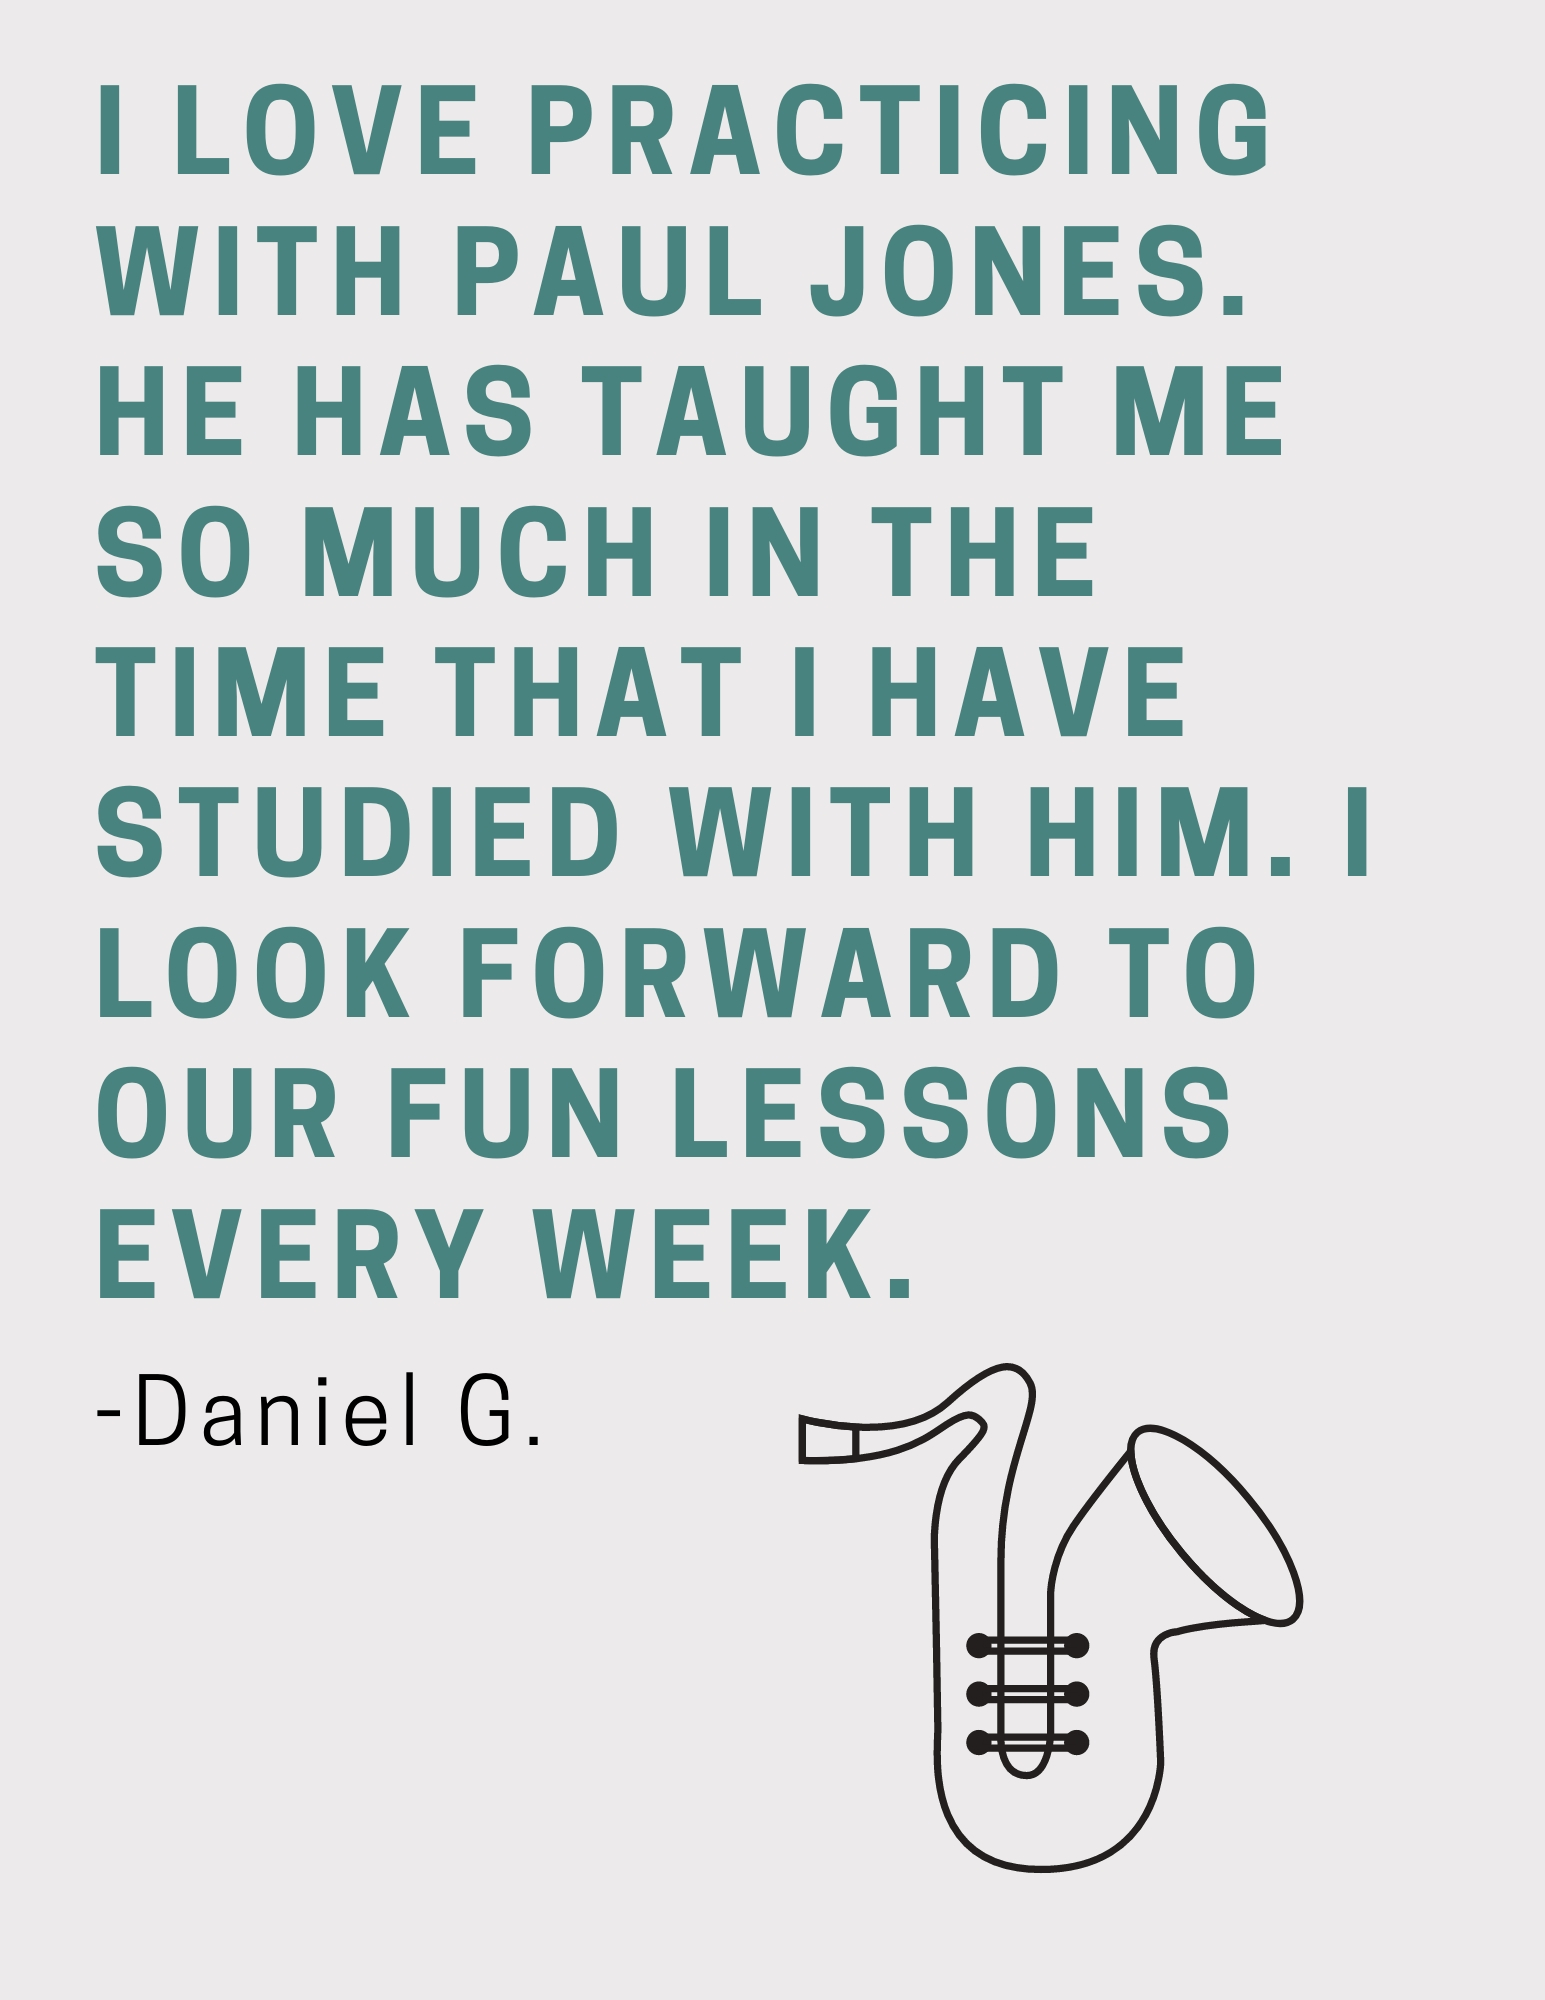 Daniel G Testimonial.jpg